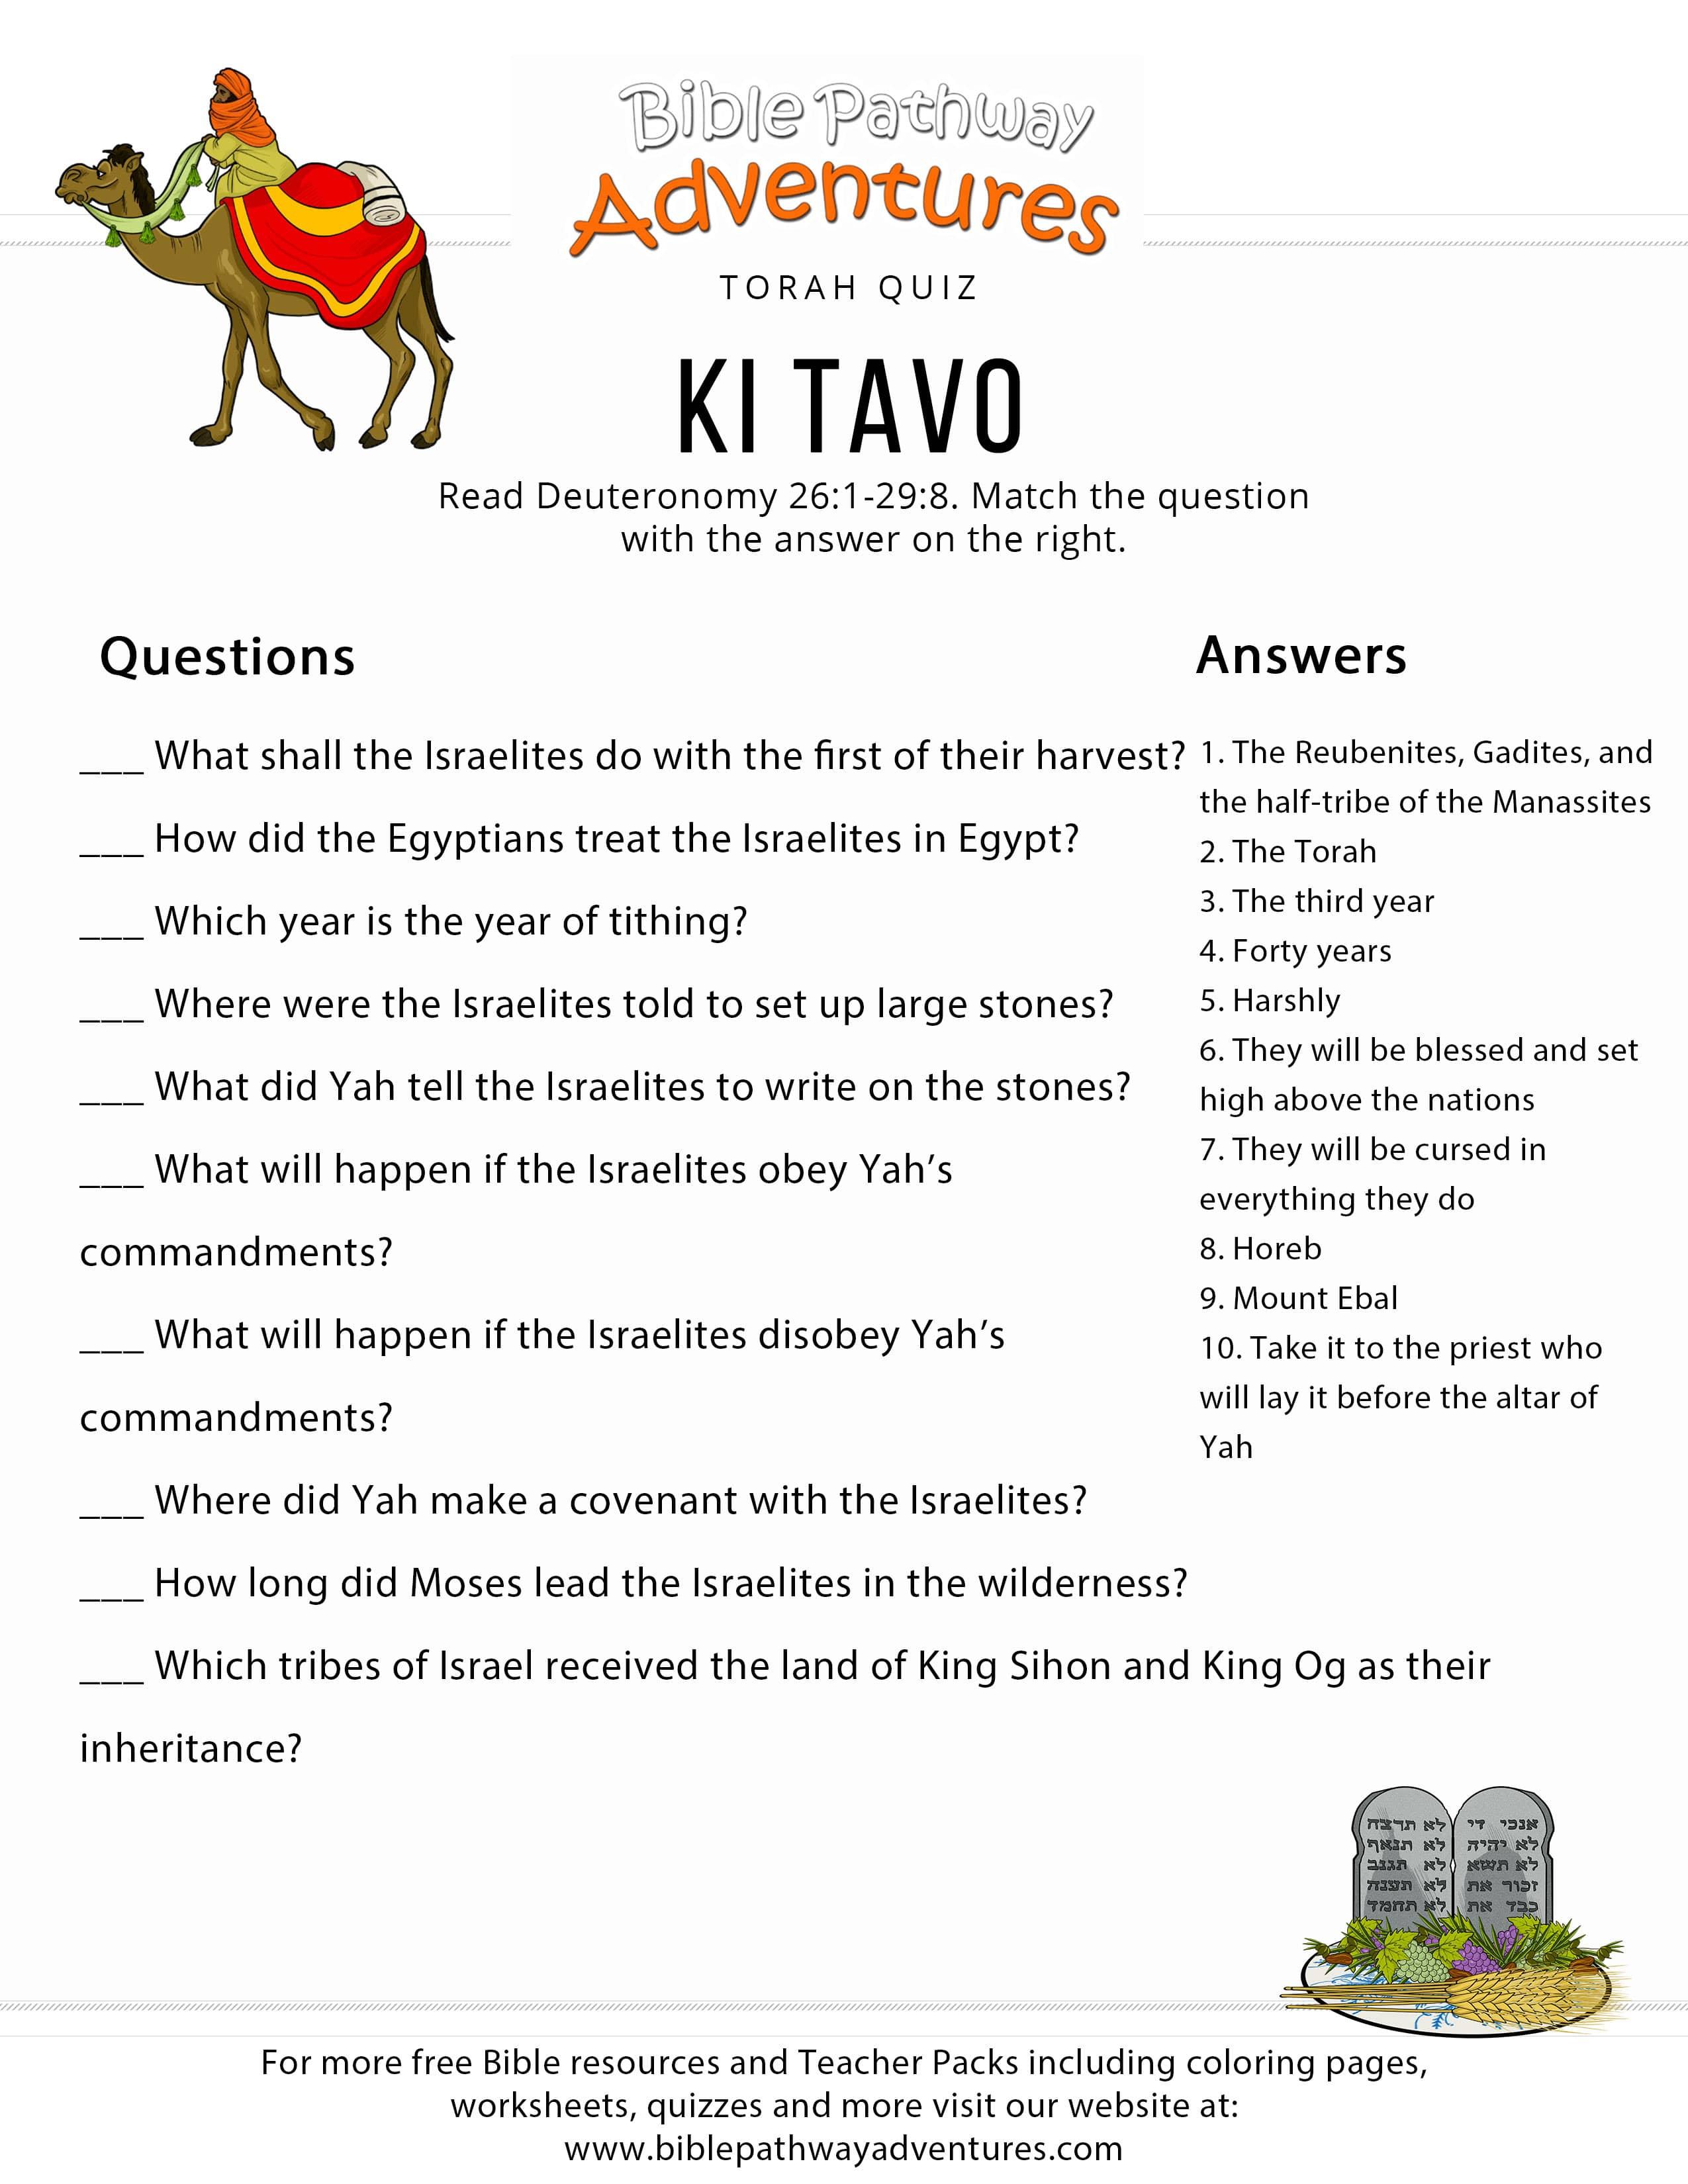 Torah Portion Ki Tavo Bible Pathway Adventures